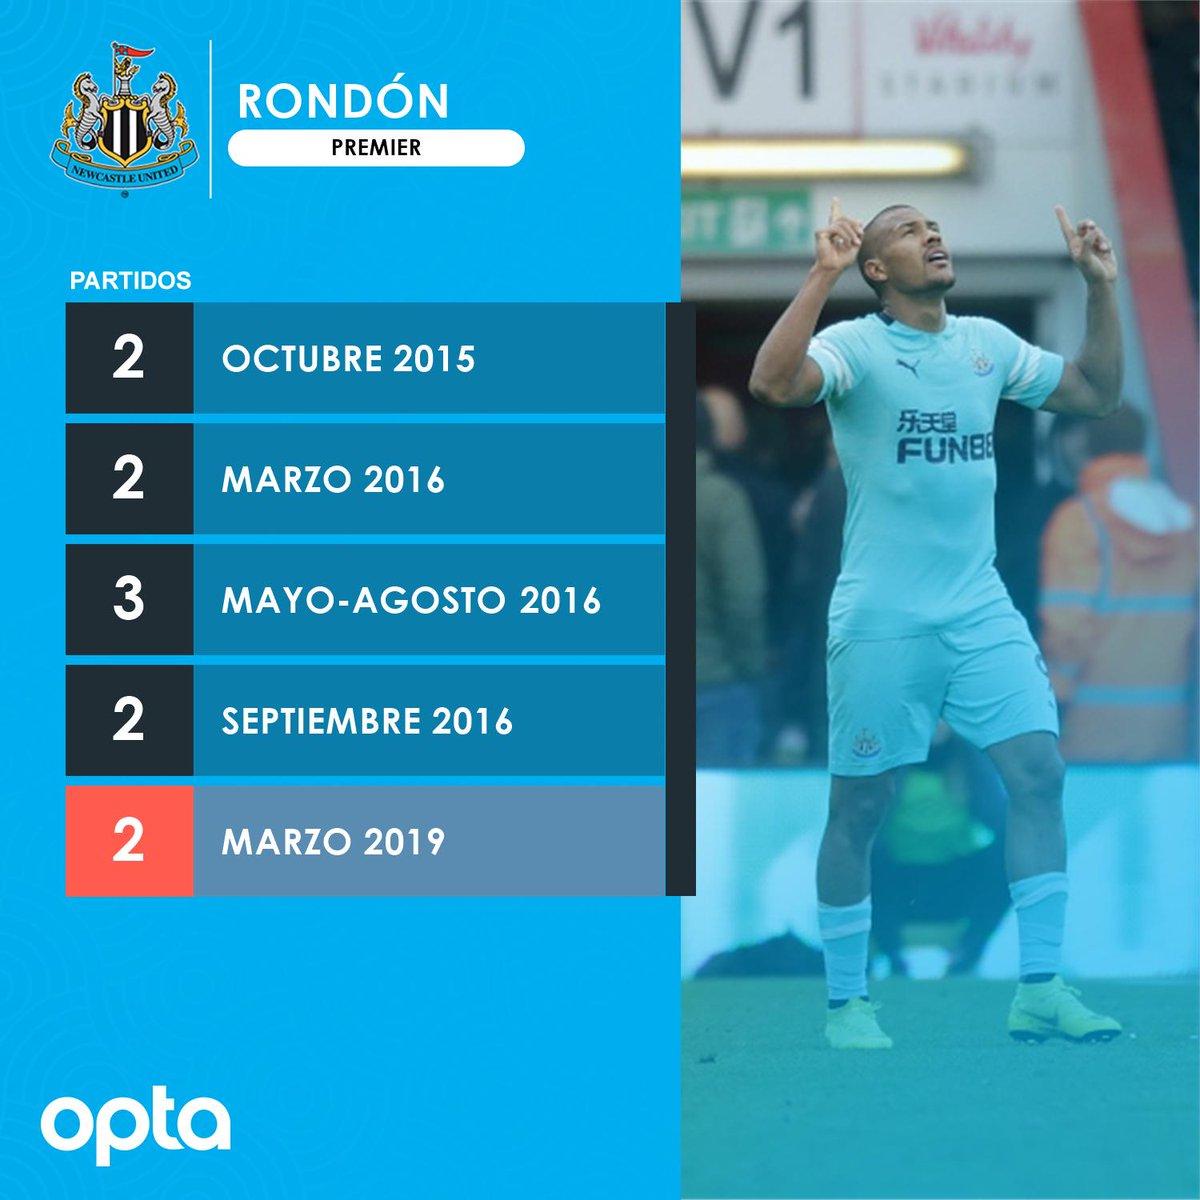 2 - @salorondon23🇻🇪logró convertir en partidos consecutivos por quinta ocasión en Premier League, primera vez desde septiembre de 2016. Rey.